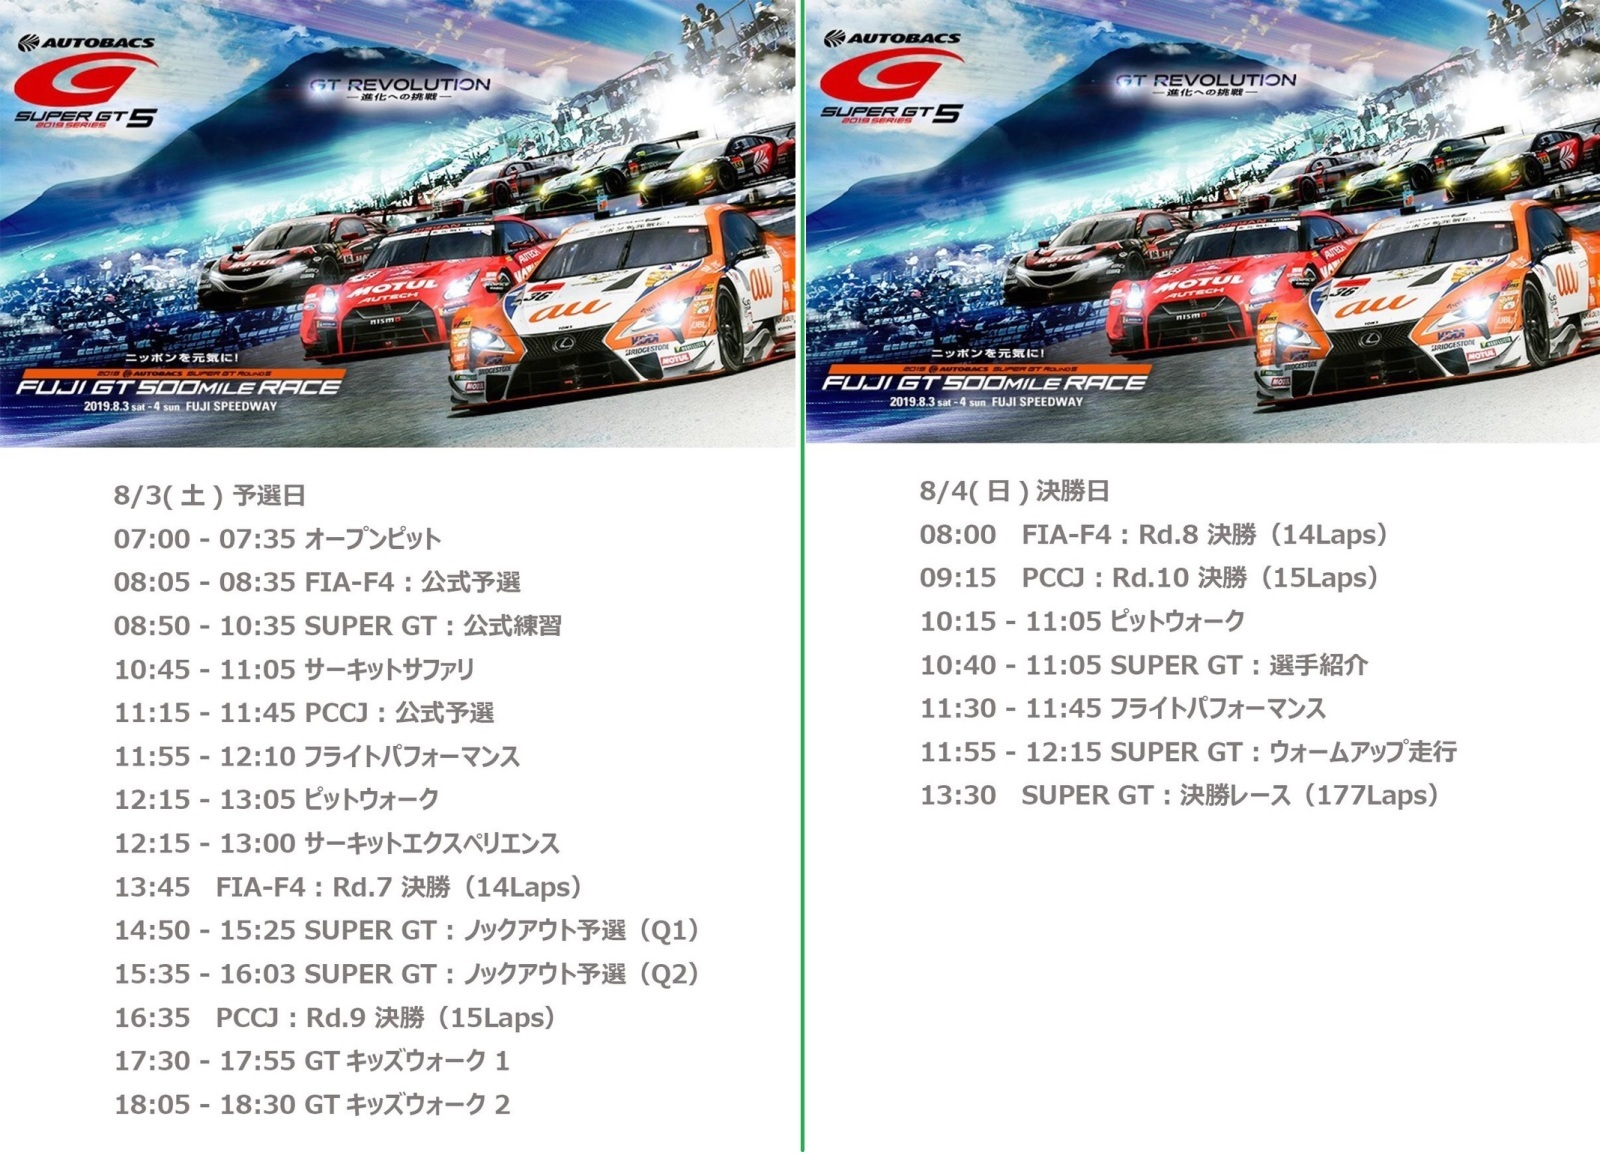 【SUPER GT Round5 富士】 サーキットサファリとミクサポ撮影会のお知らせ_e0379343_16240697.jpg